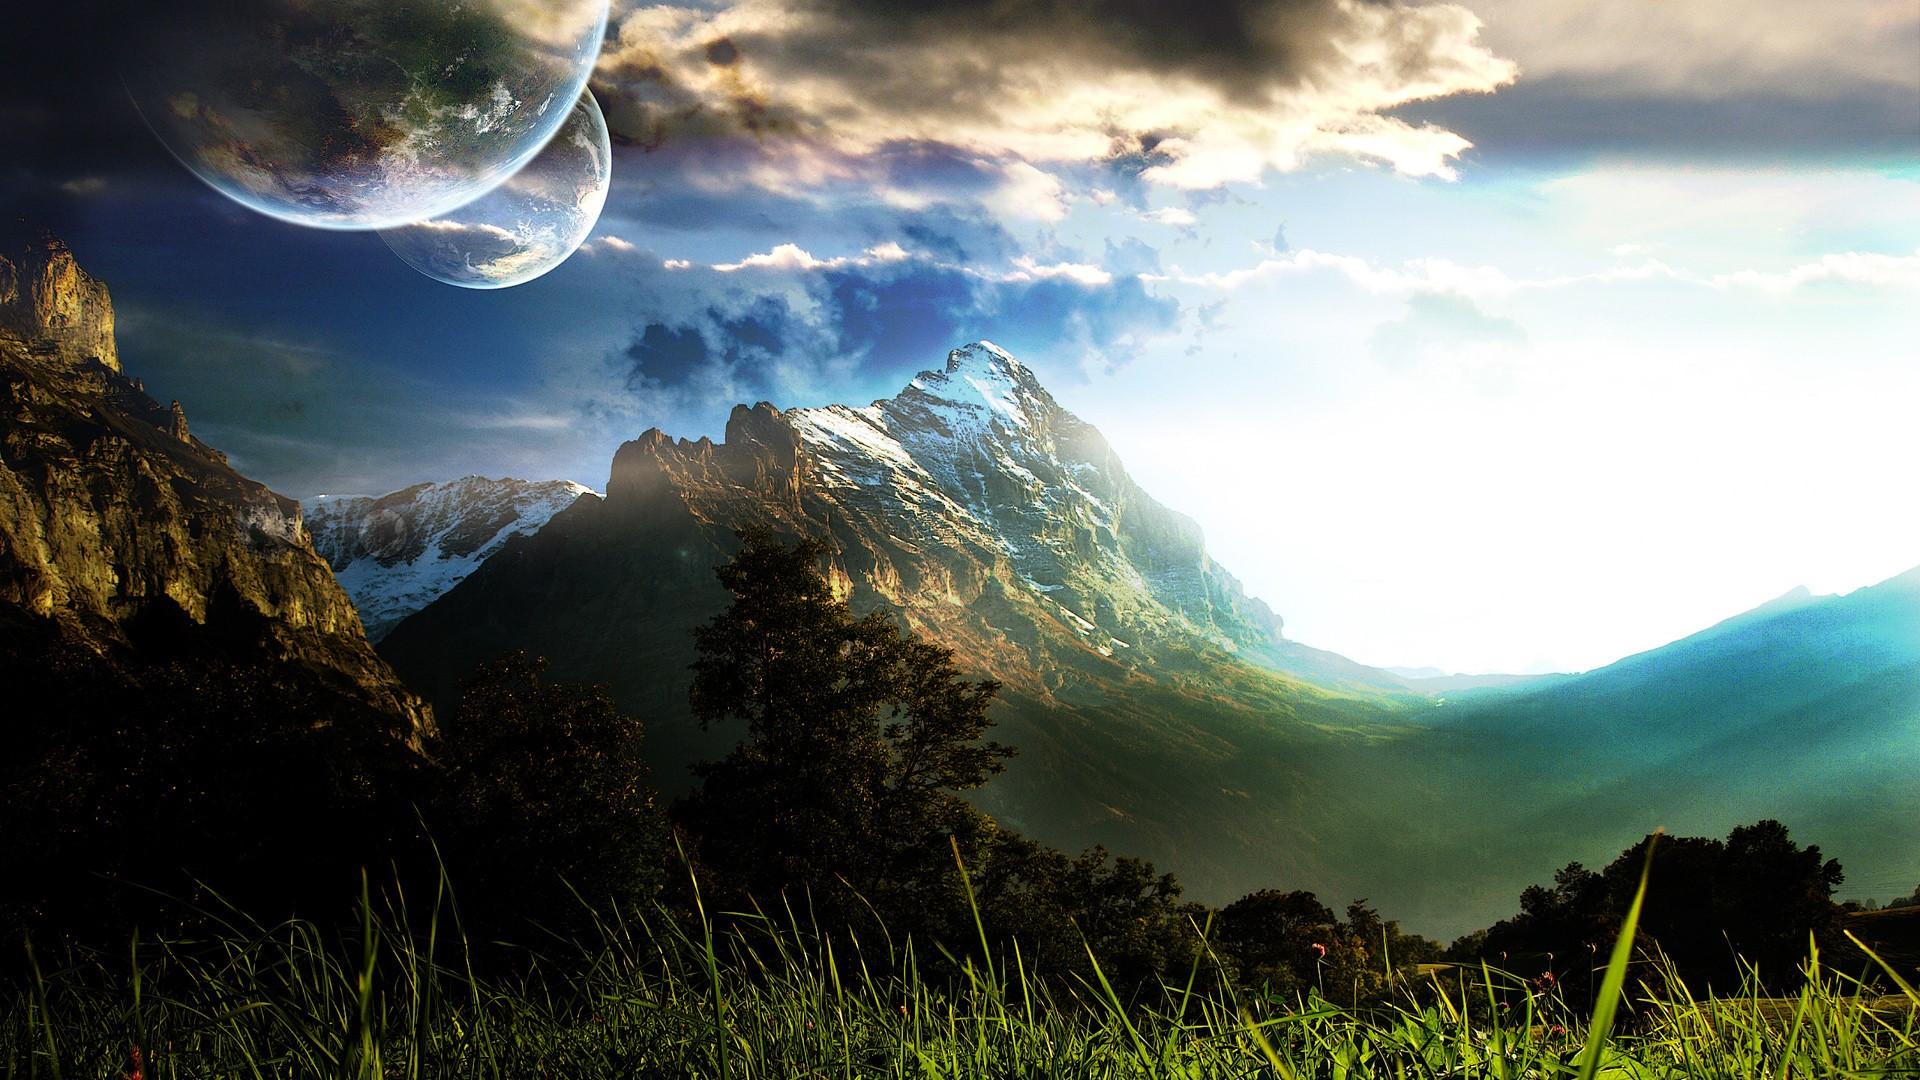 HD Nature - Landscape Wallpapers 4